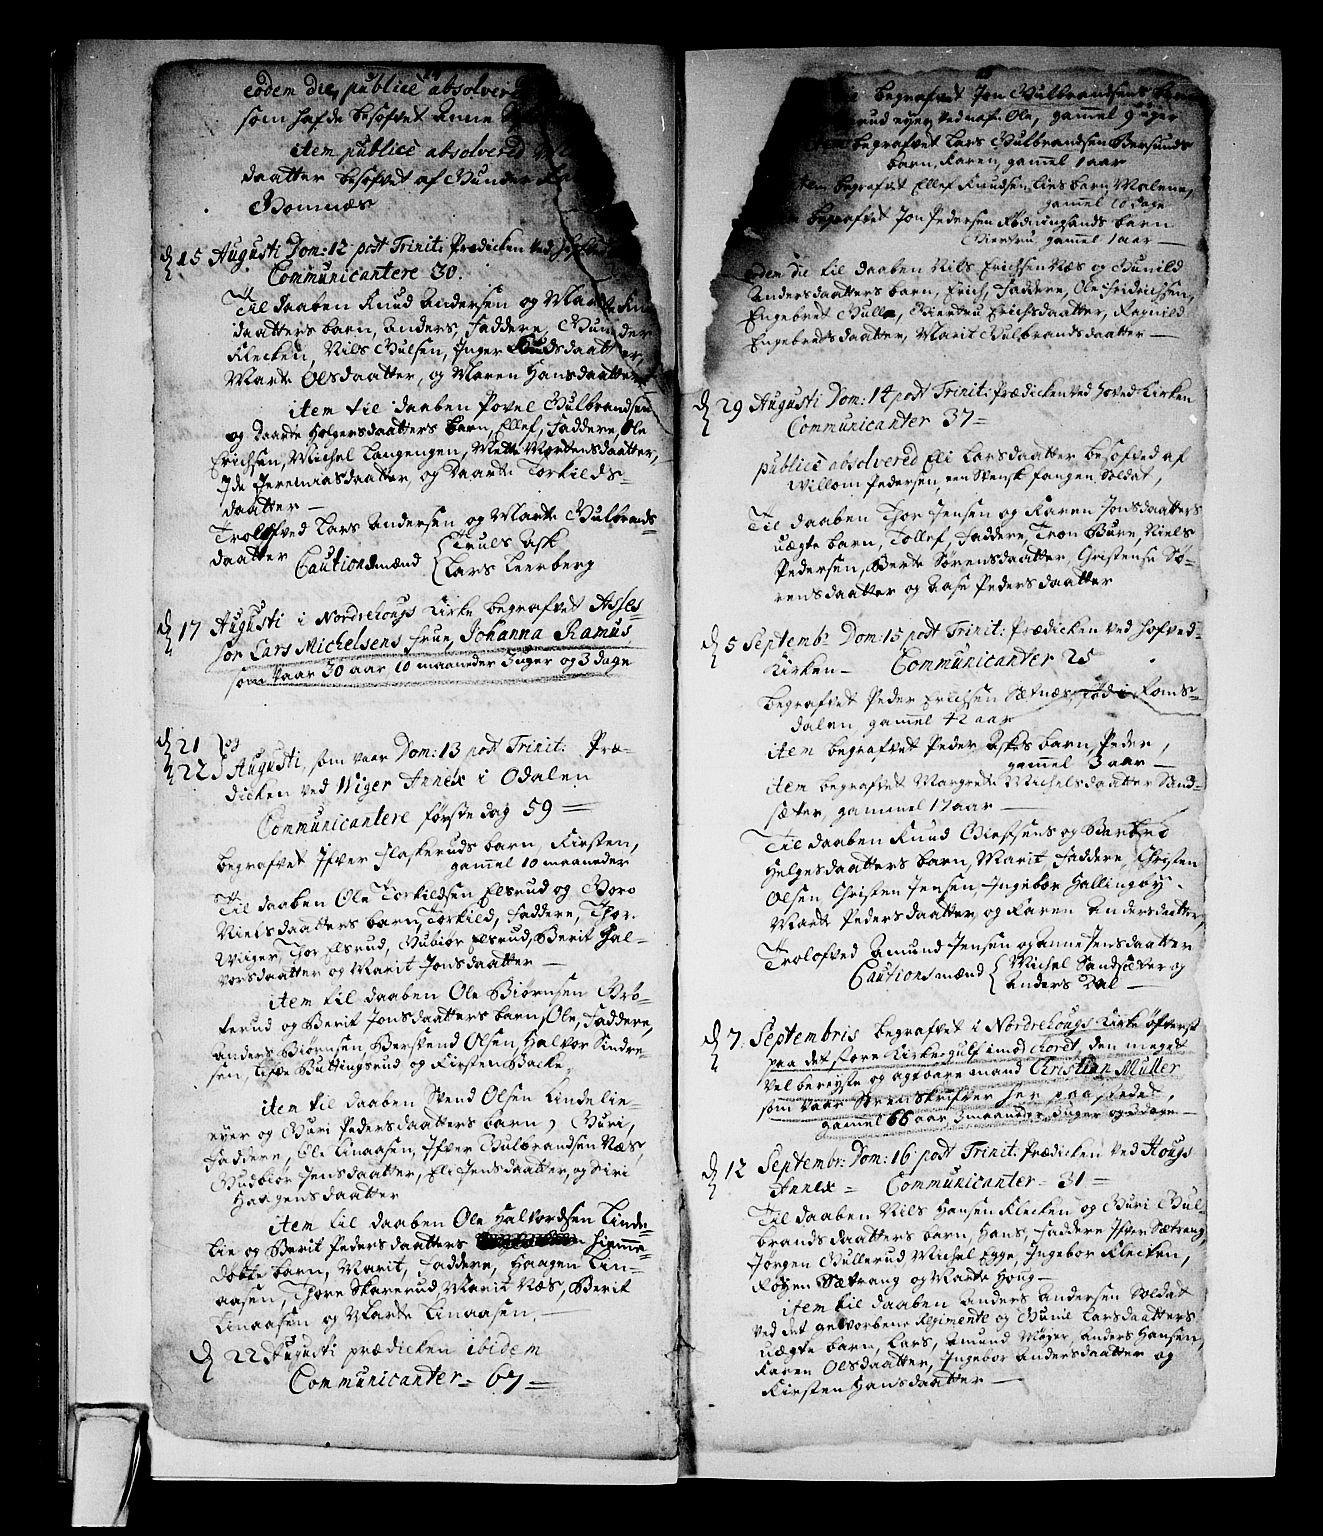 SAKO, Norderhov kirkebøker, F/Fa/L0002a: Ministerialbok nr. 2A, 1716-1725, s. 24-25